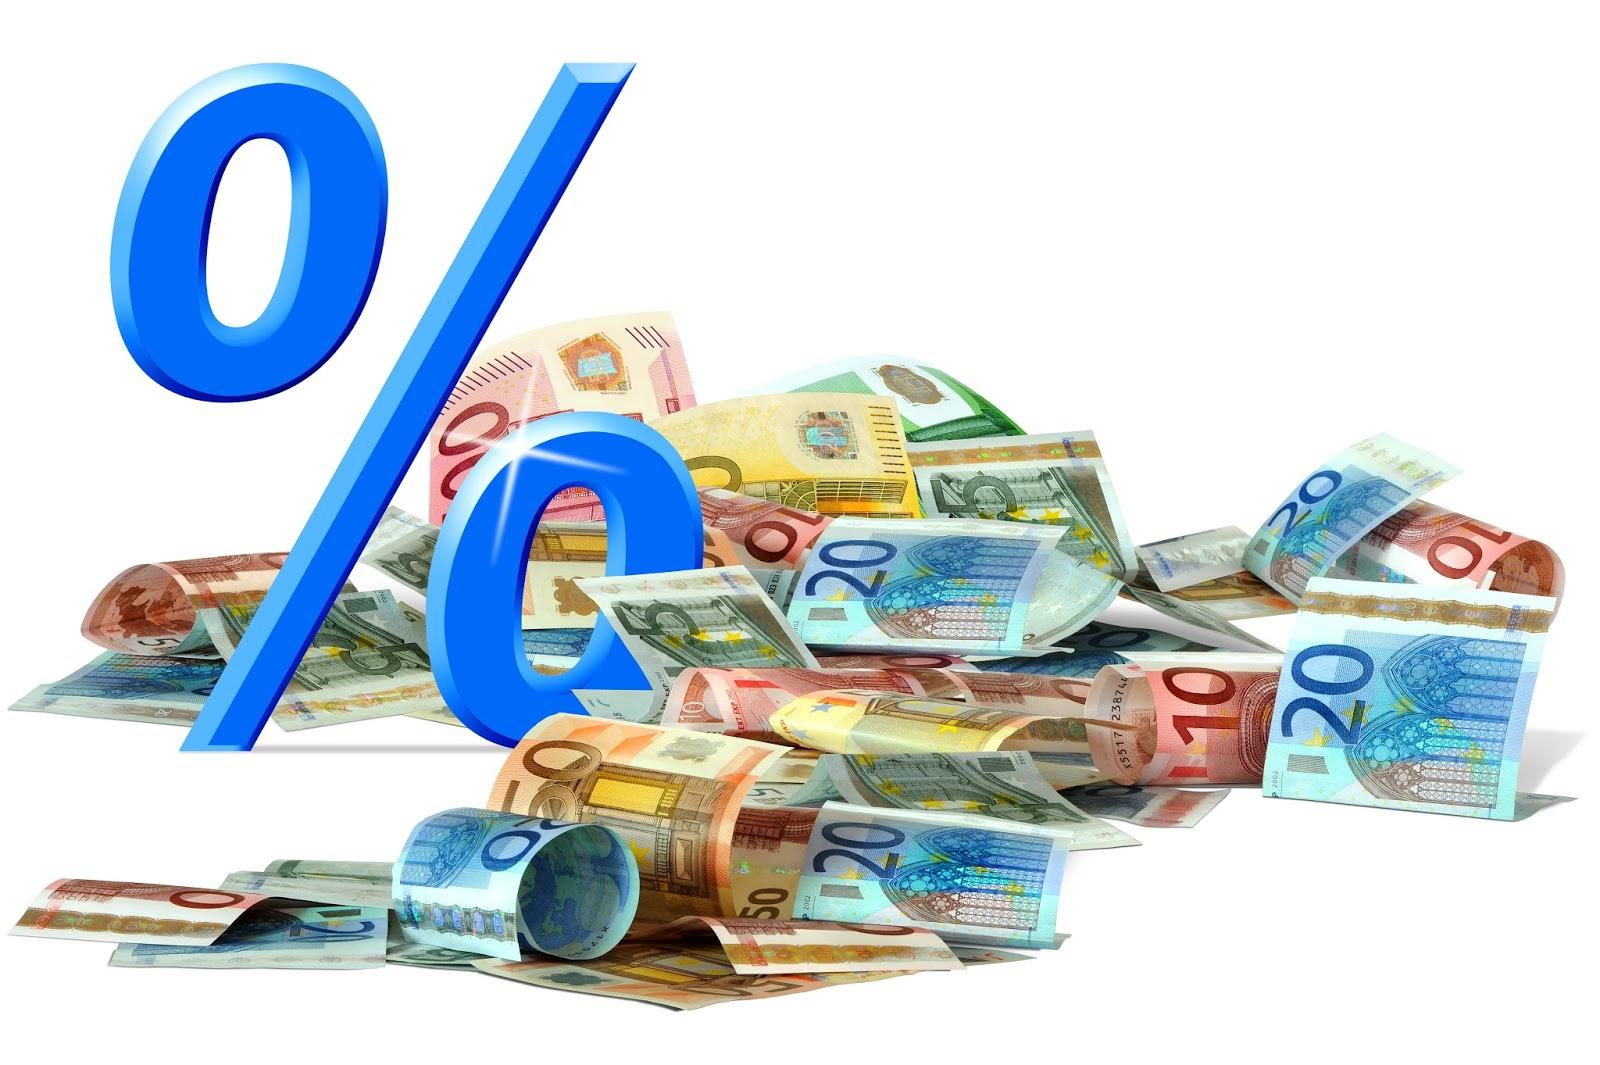 проценты на займ денежных средств